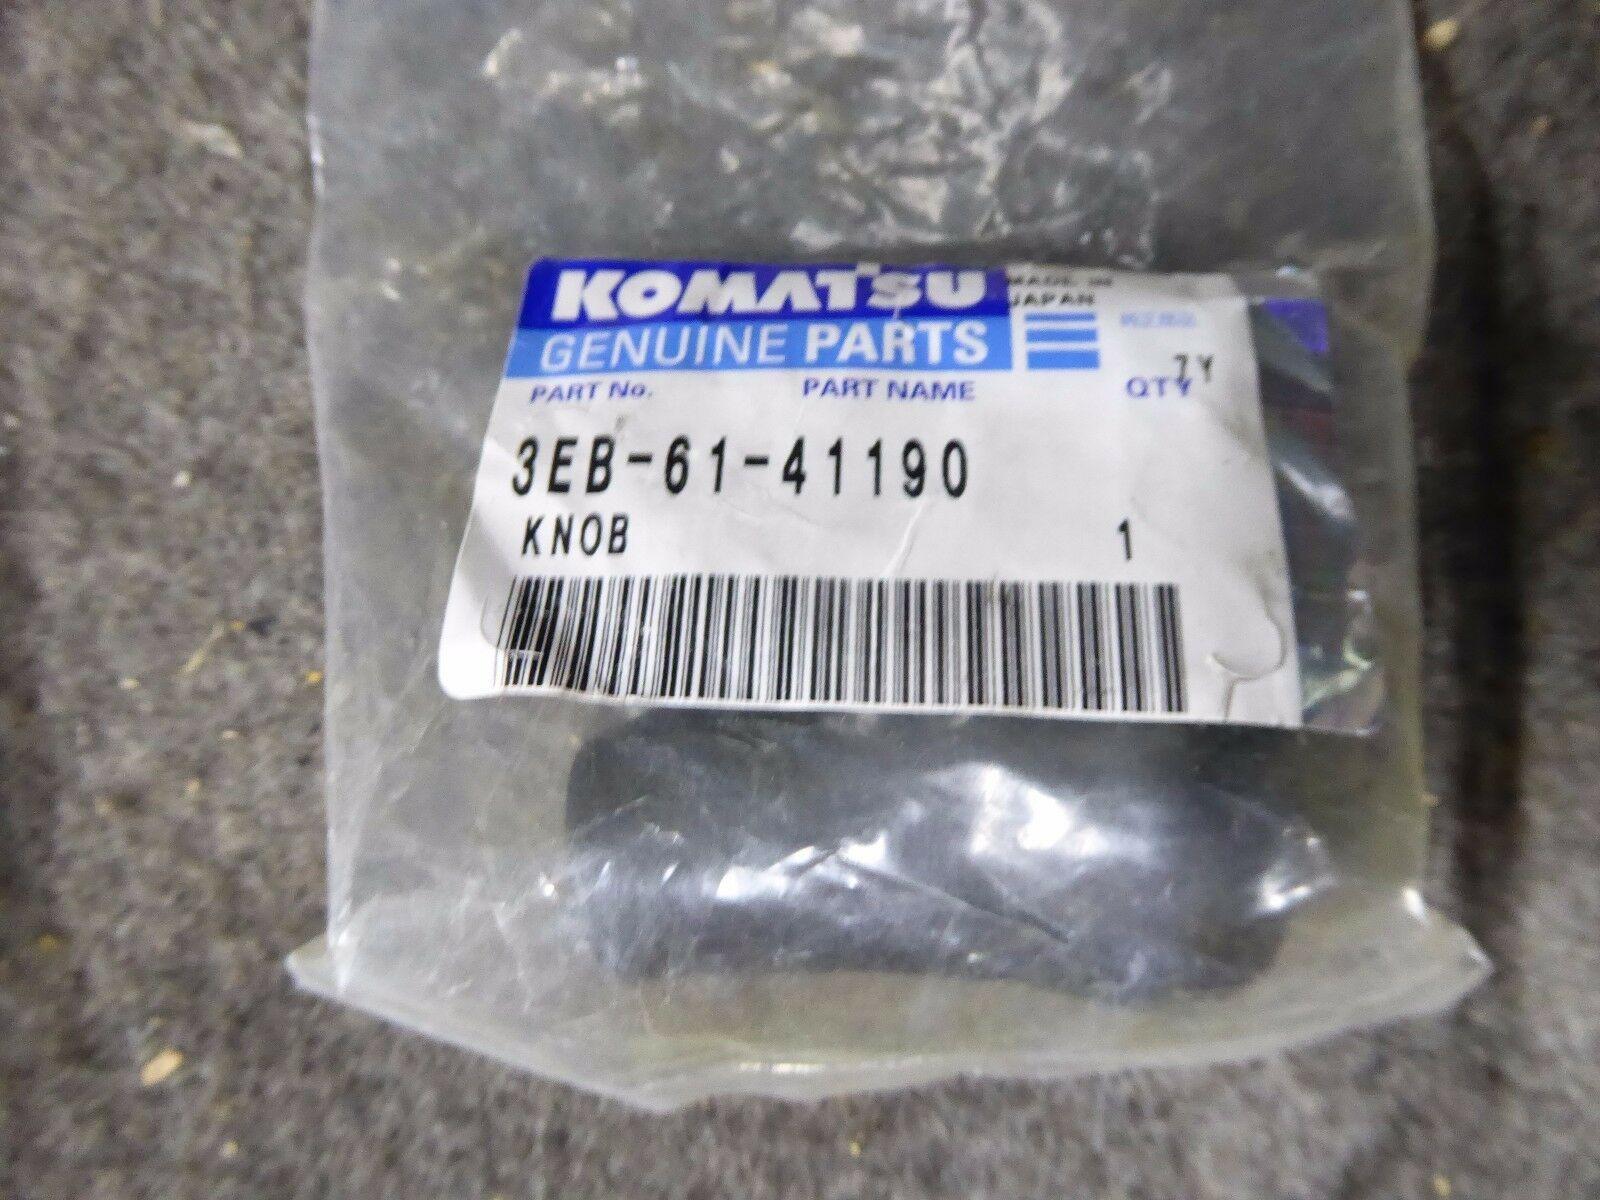 Genuine Komatsu Knob 3EB-61-41190